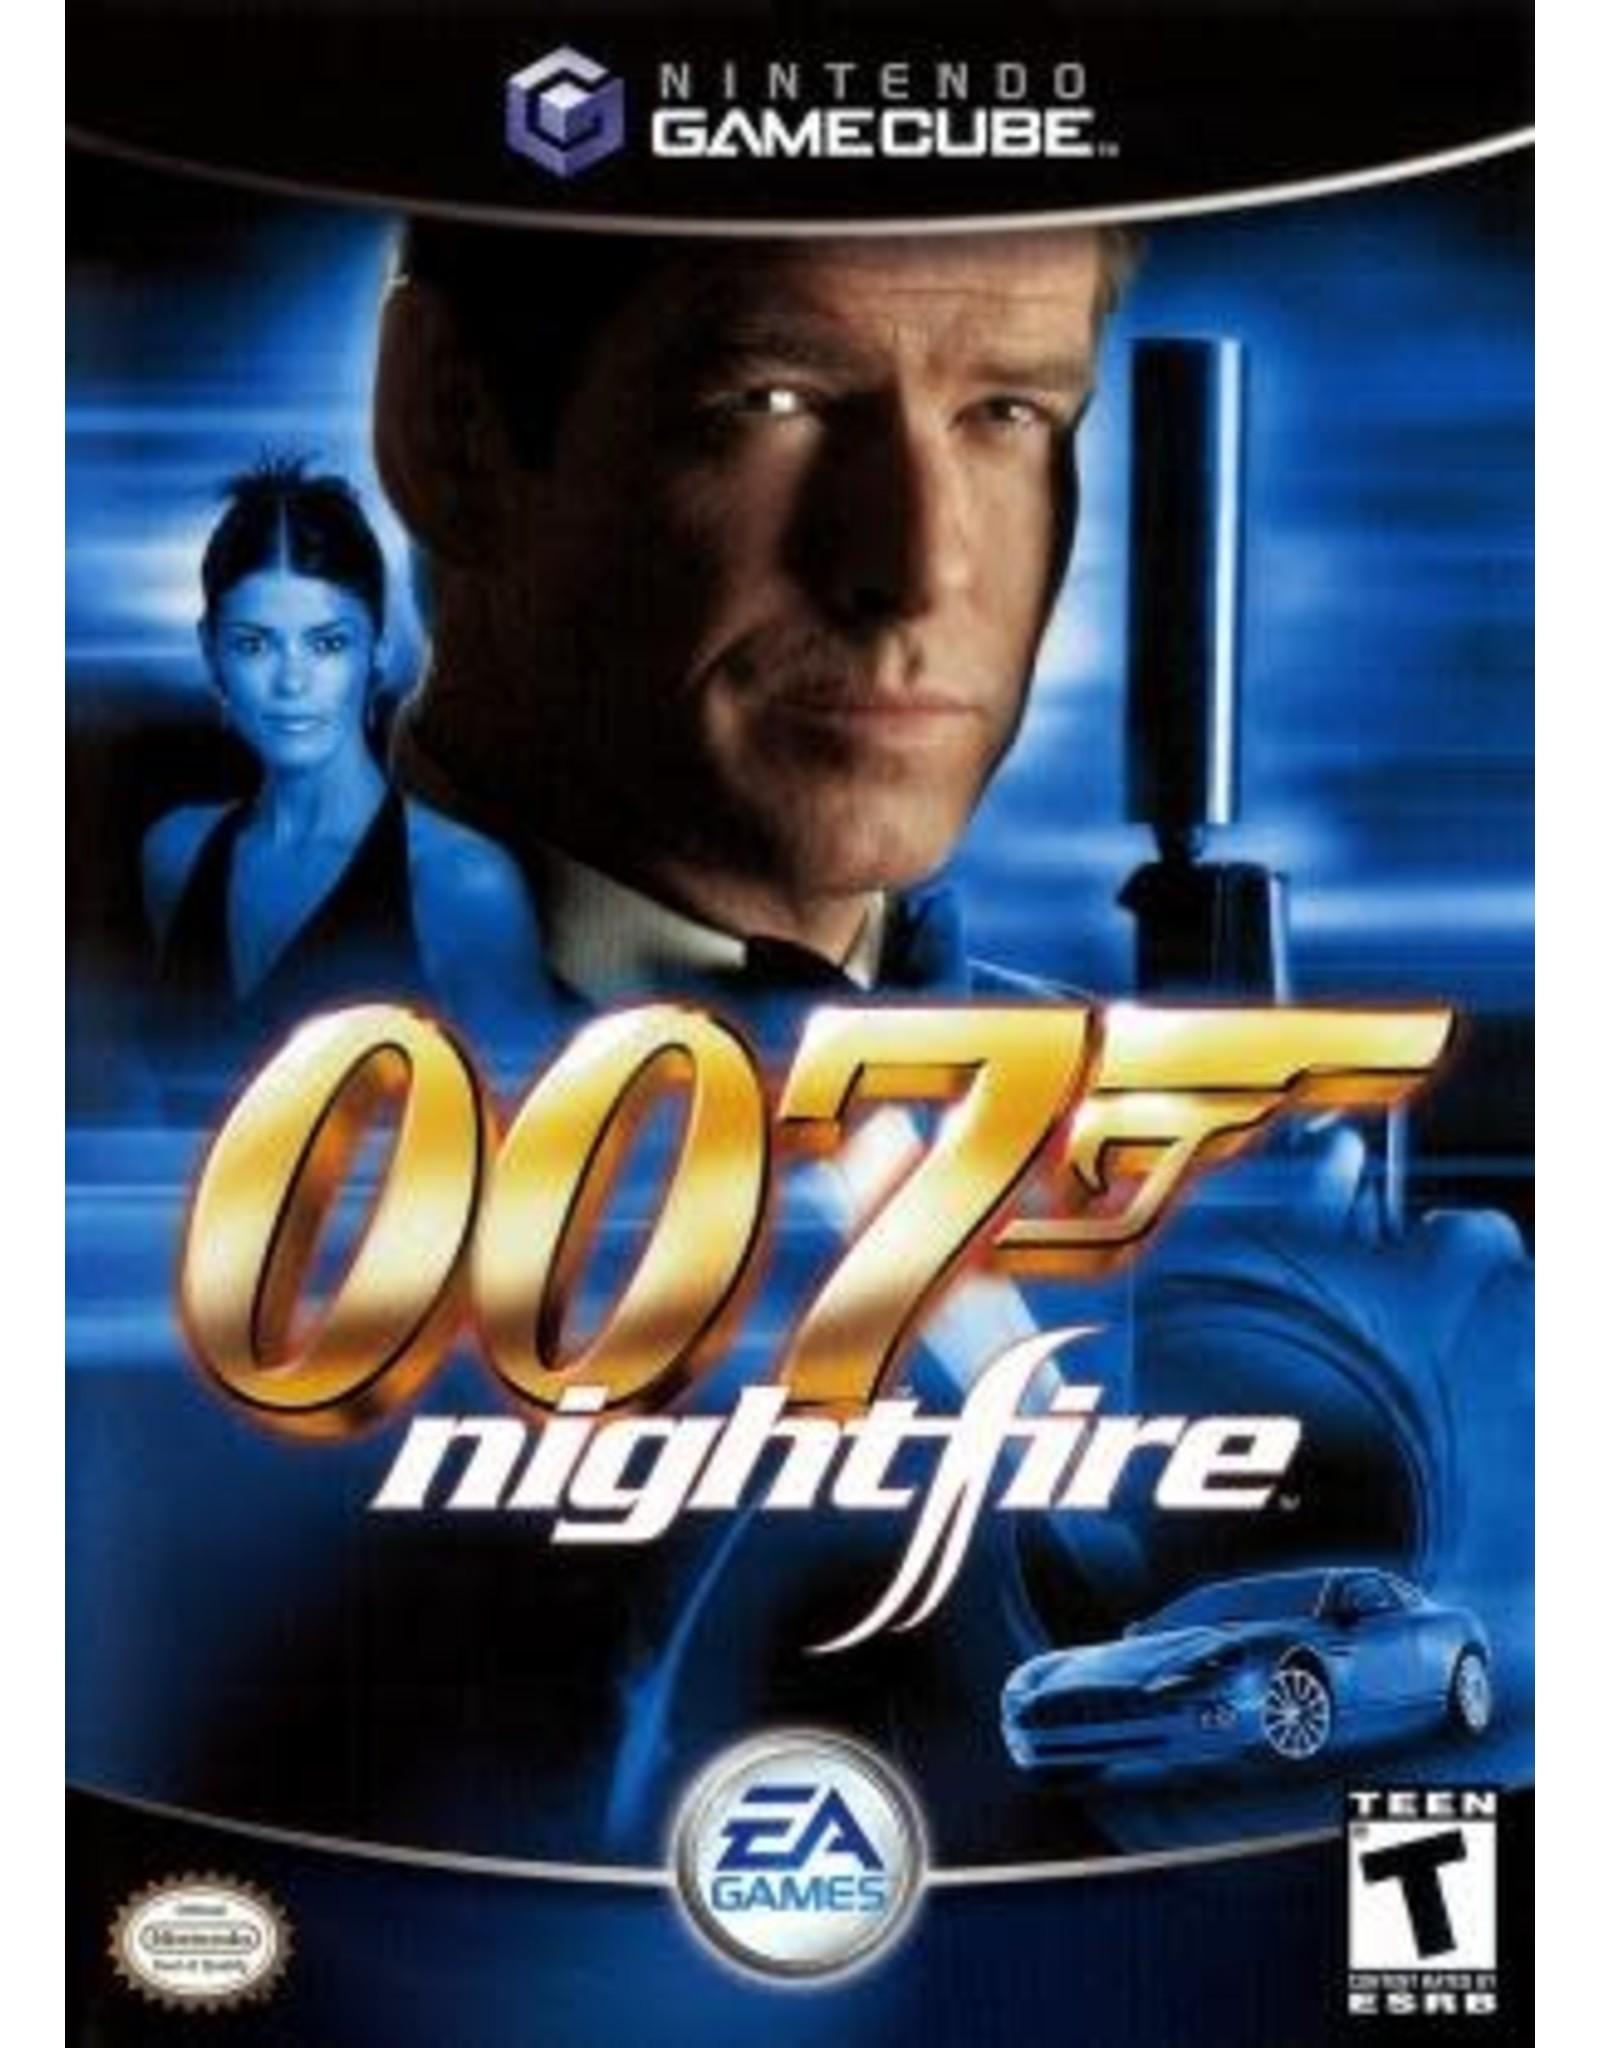 Gamecube 007 Nightfire (CiB)